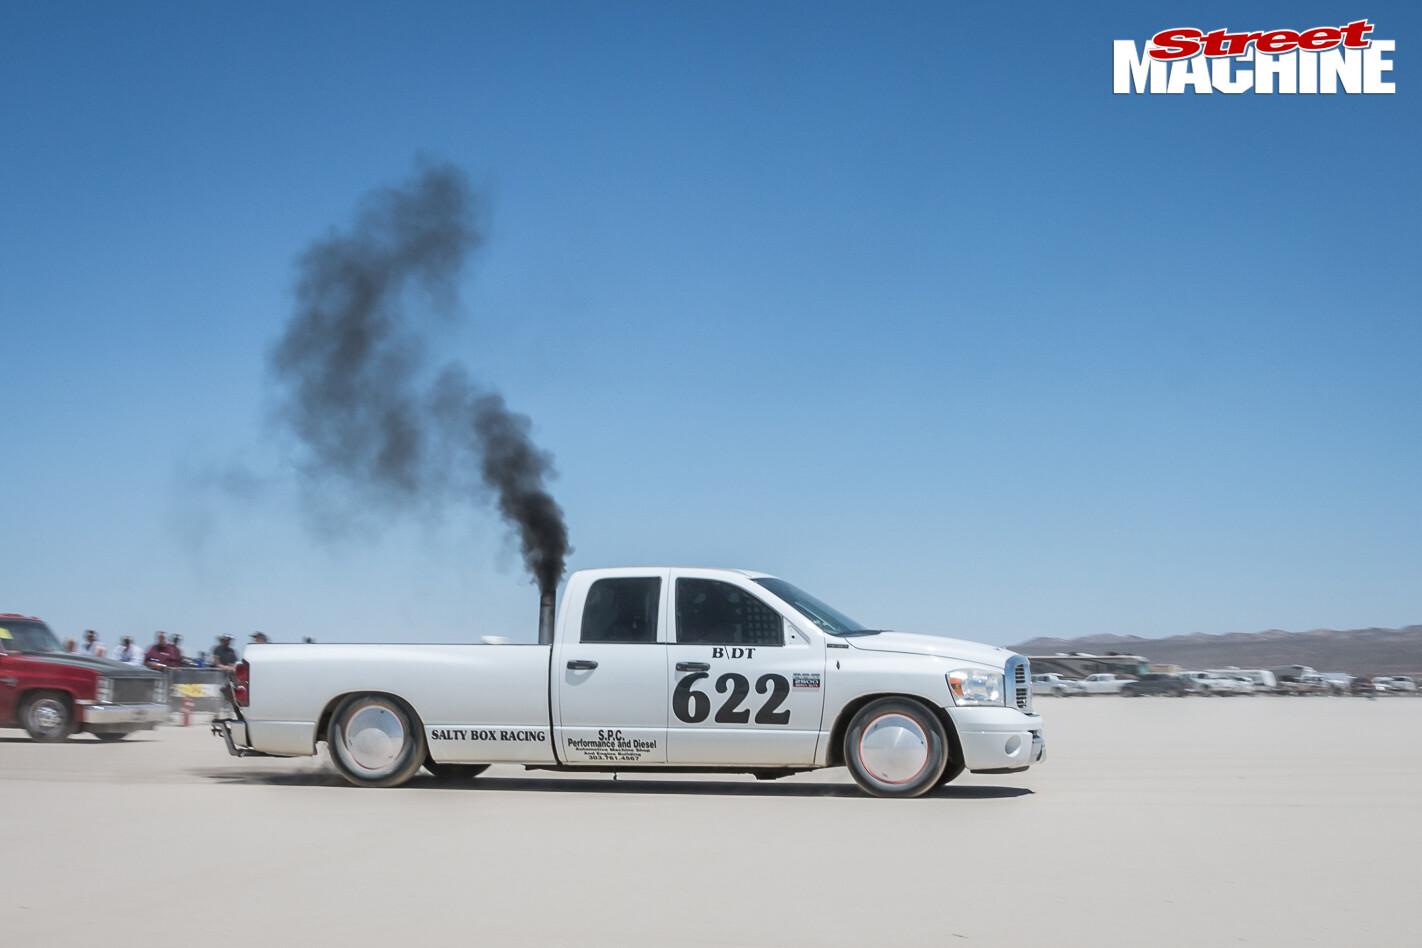 Dodge -Ram -El -Mirage -Salty -Box -Racing -0641